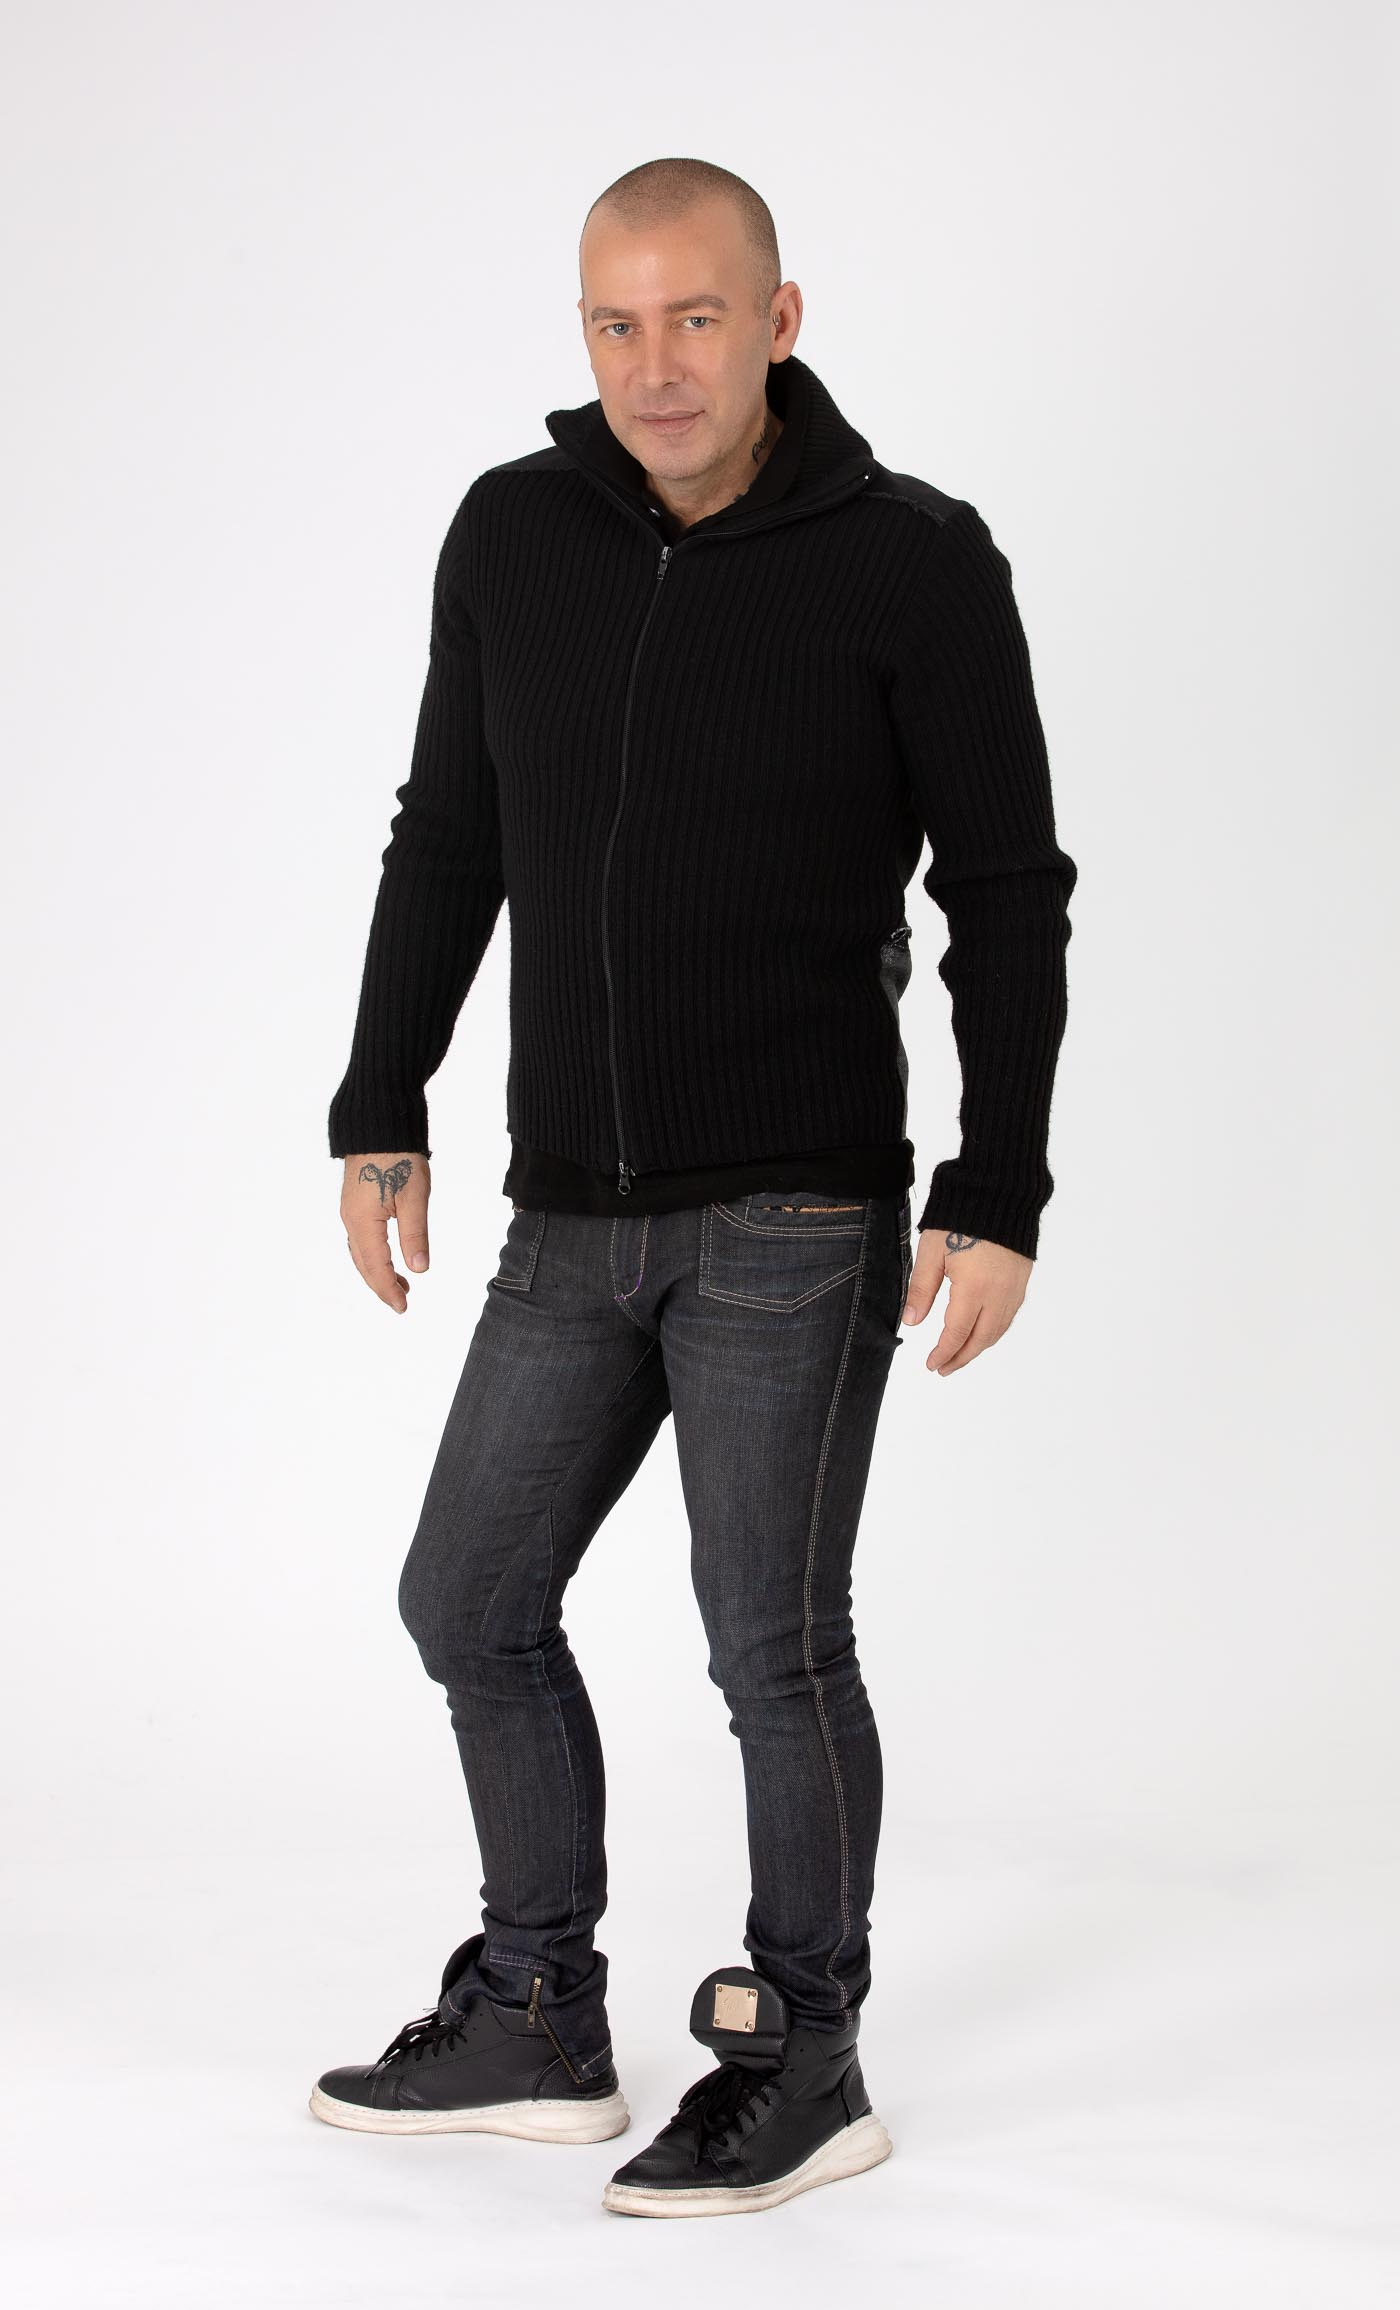 Model Male full body model portfolio sample 2